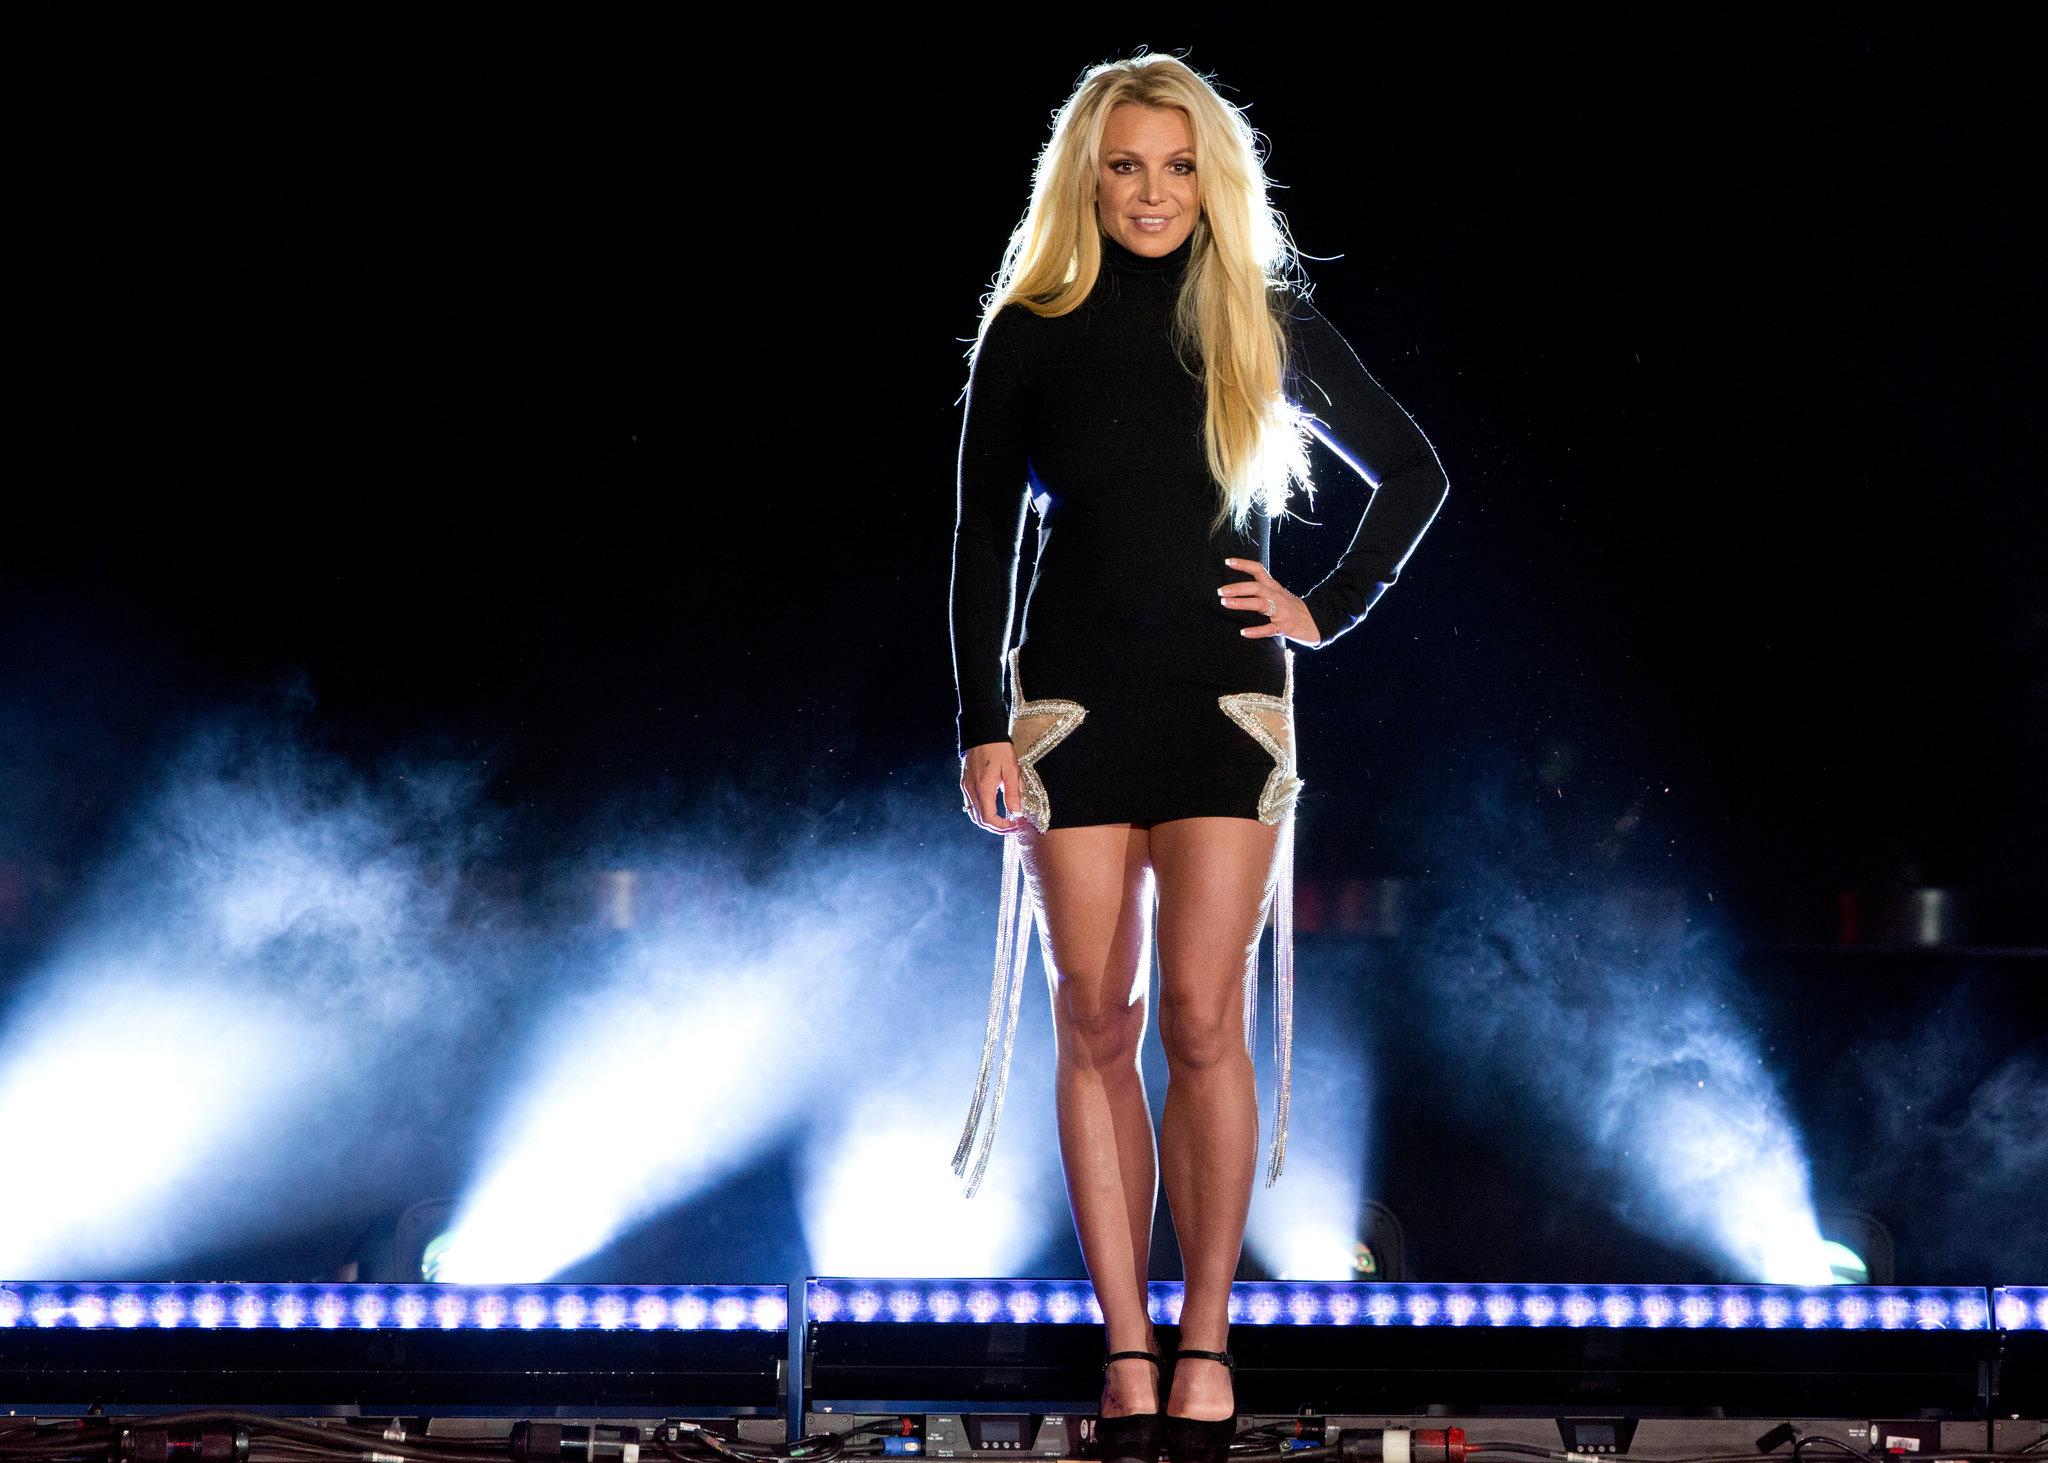 #FreeBritney Pt. II: Britney Spears Back in Court